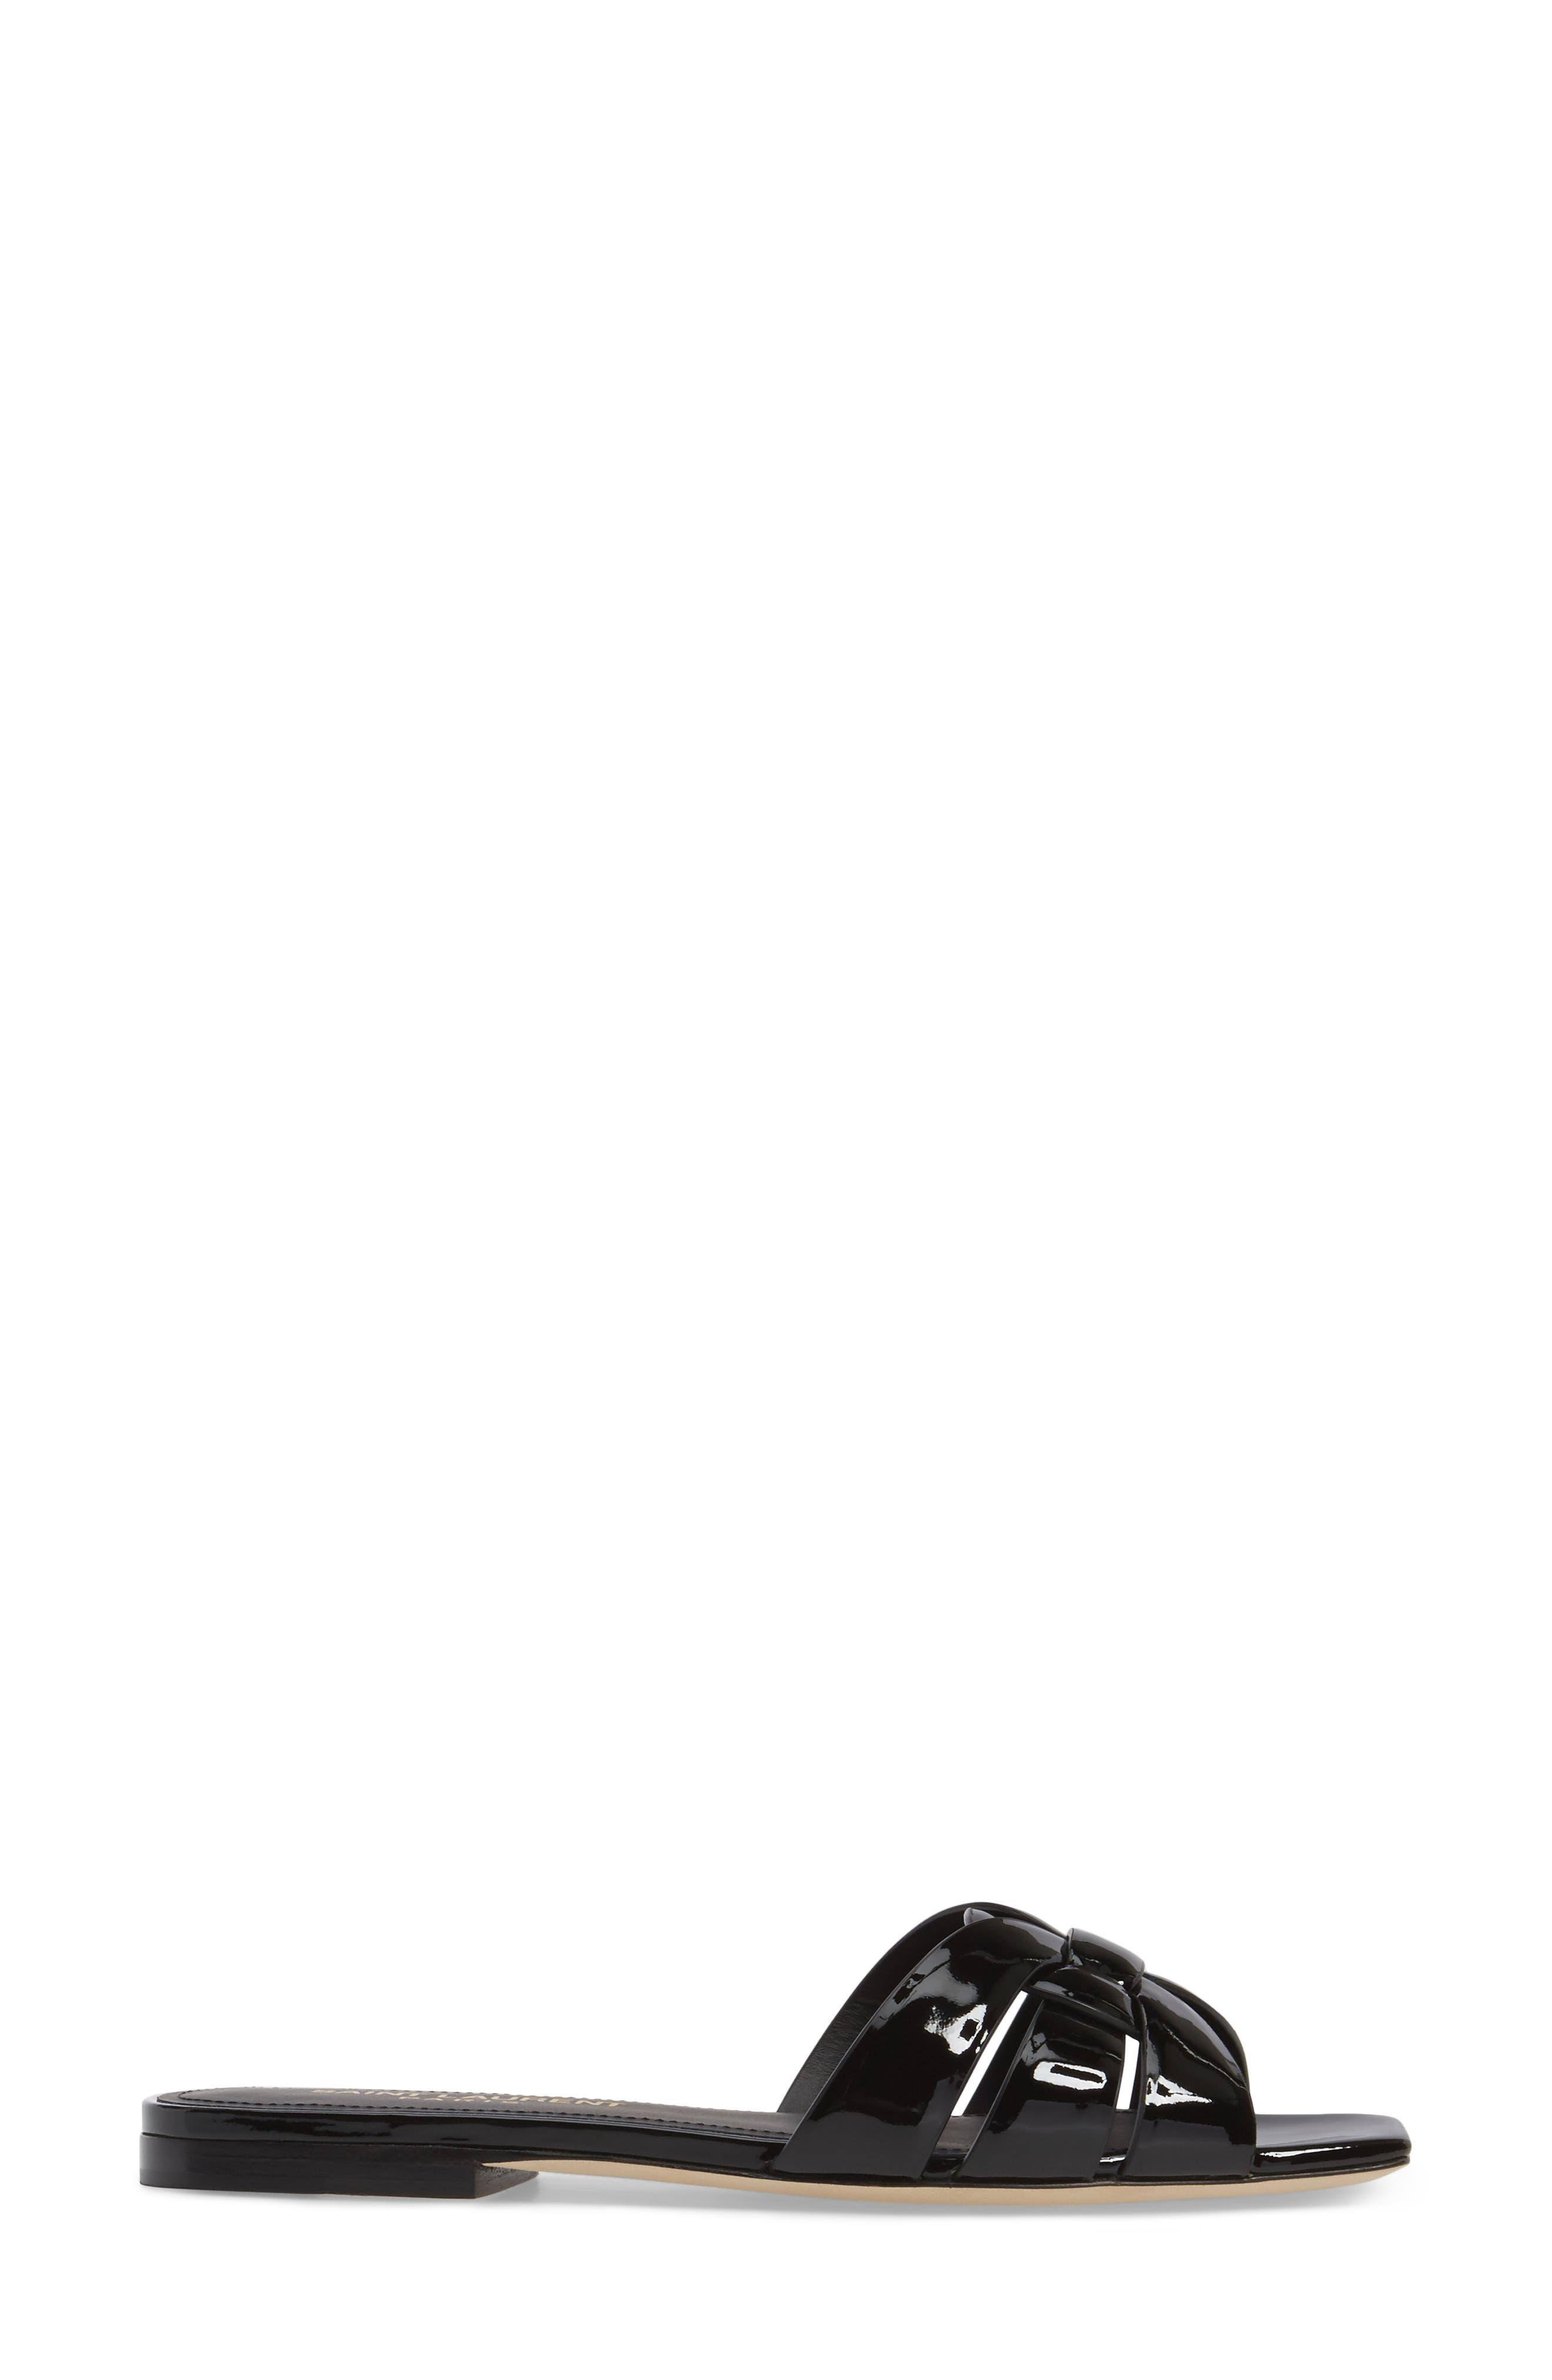 SAINT LAURENT, Tribute Slide Sandal, Alternate thumbnail 3, color, BLACK PATENT